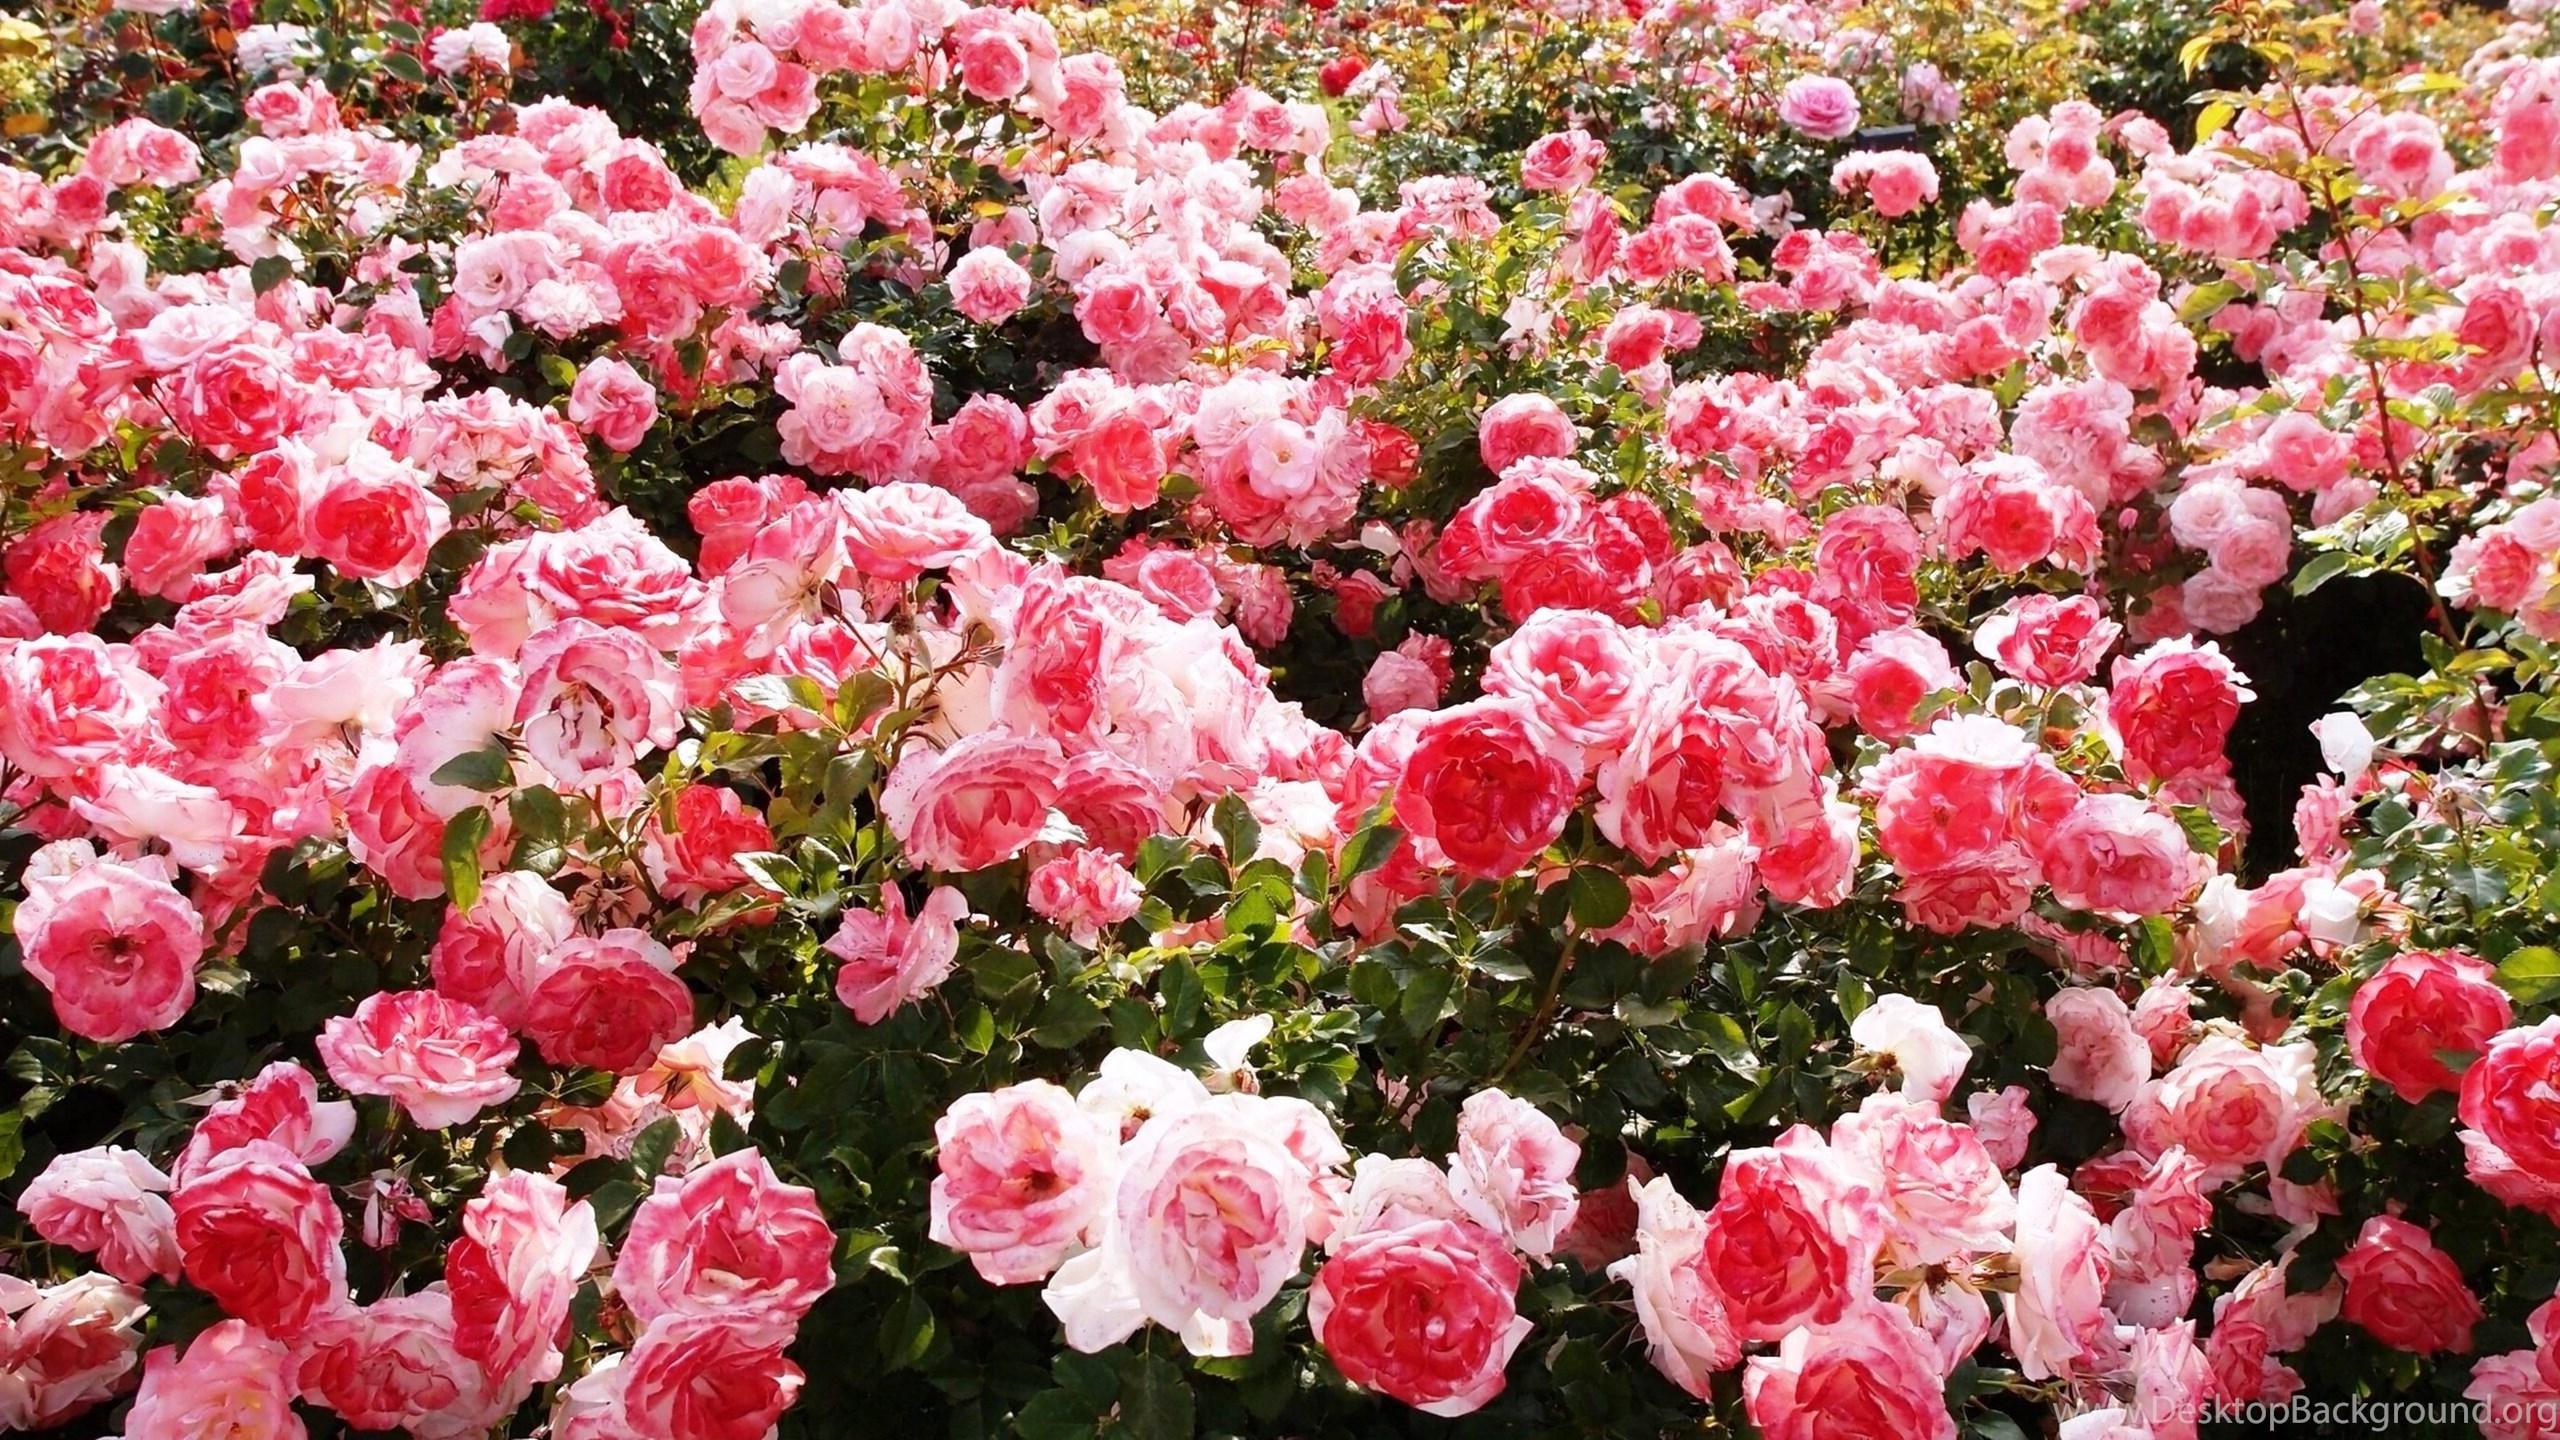 Roses In Garden: JustShare Desktop Background